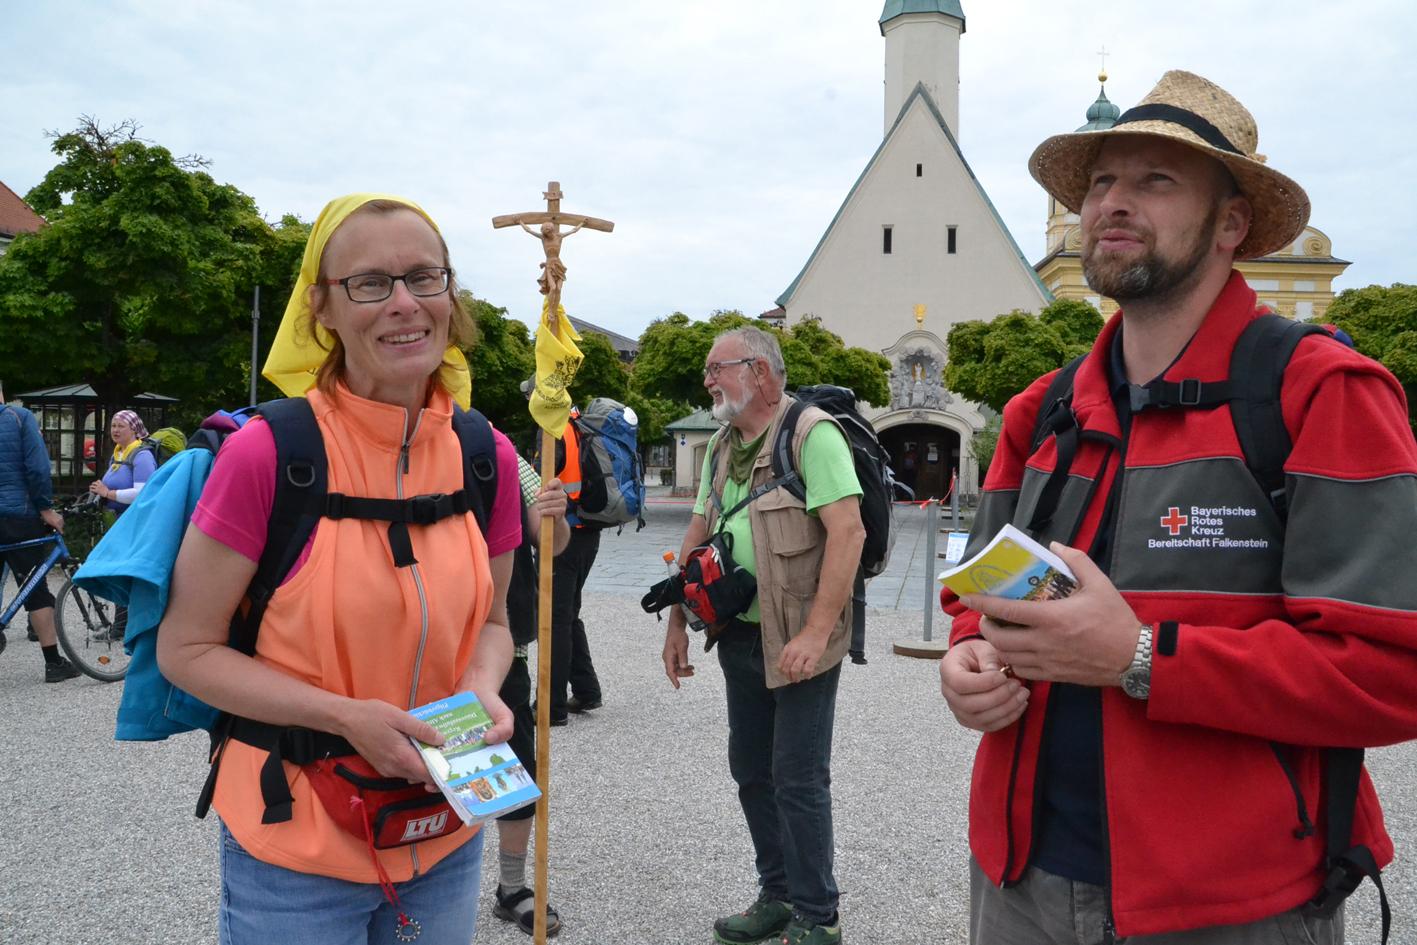 2020 06 04 aoelfb wallfahrt regensburg6